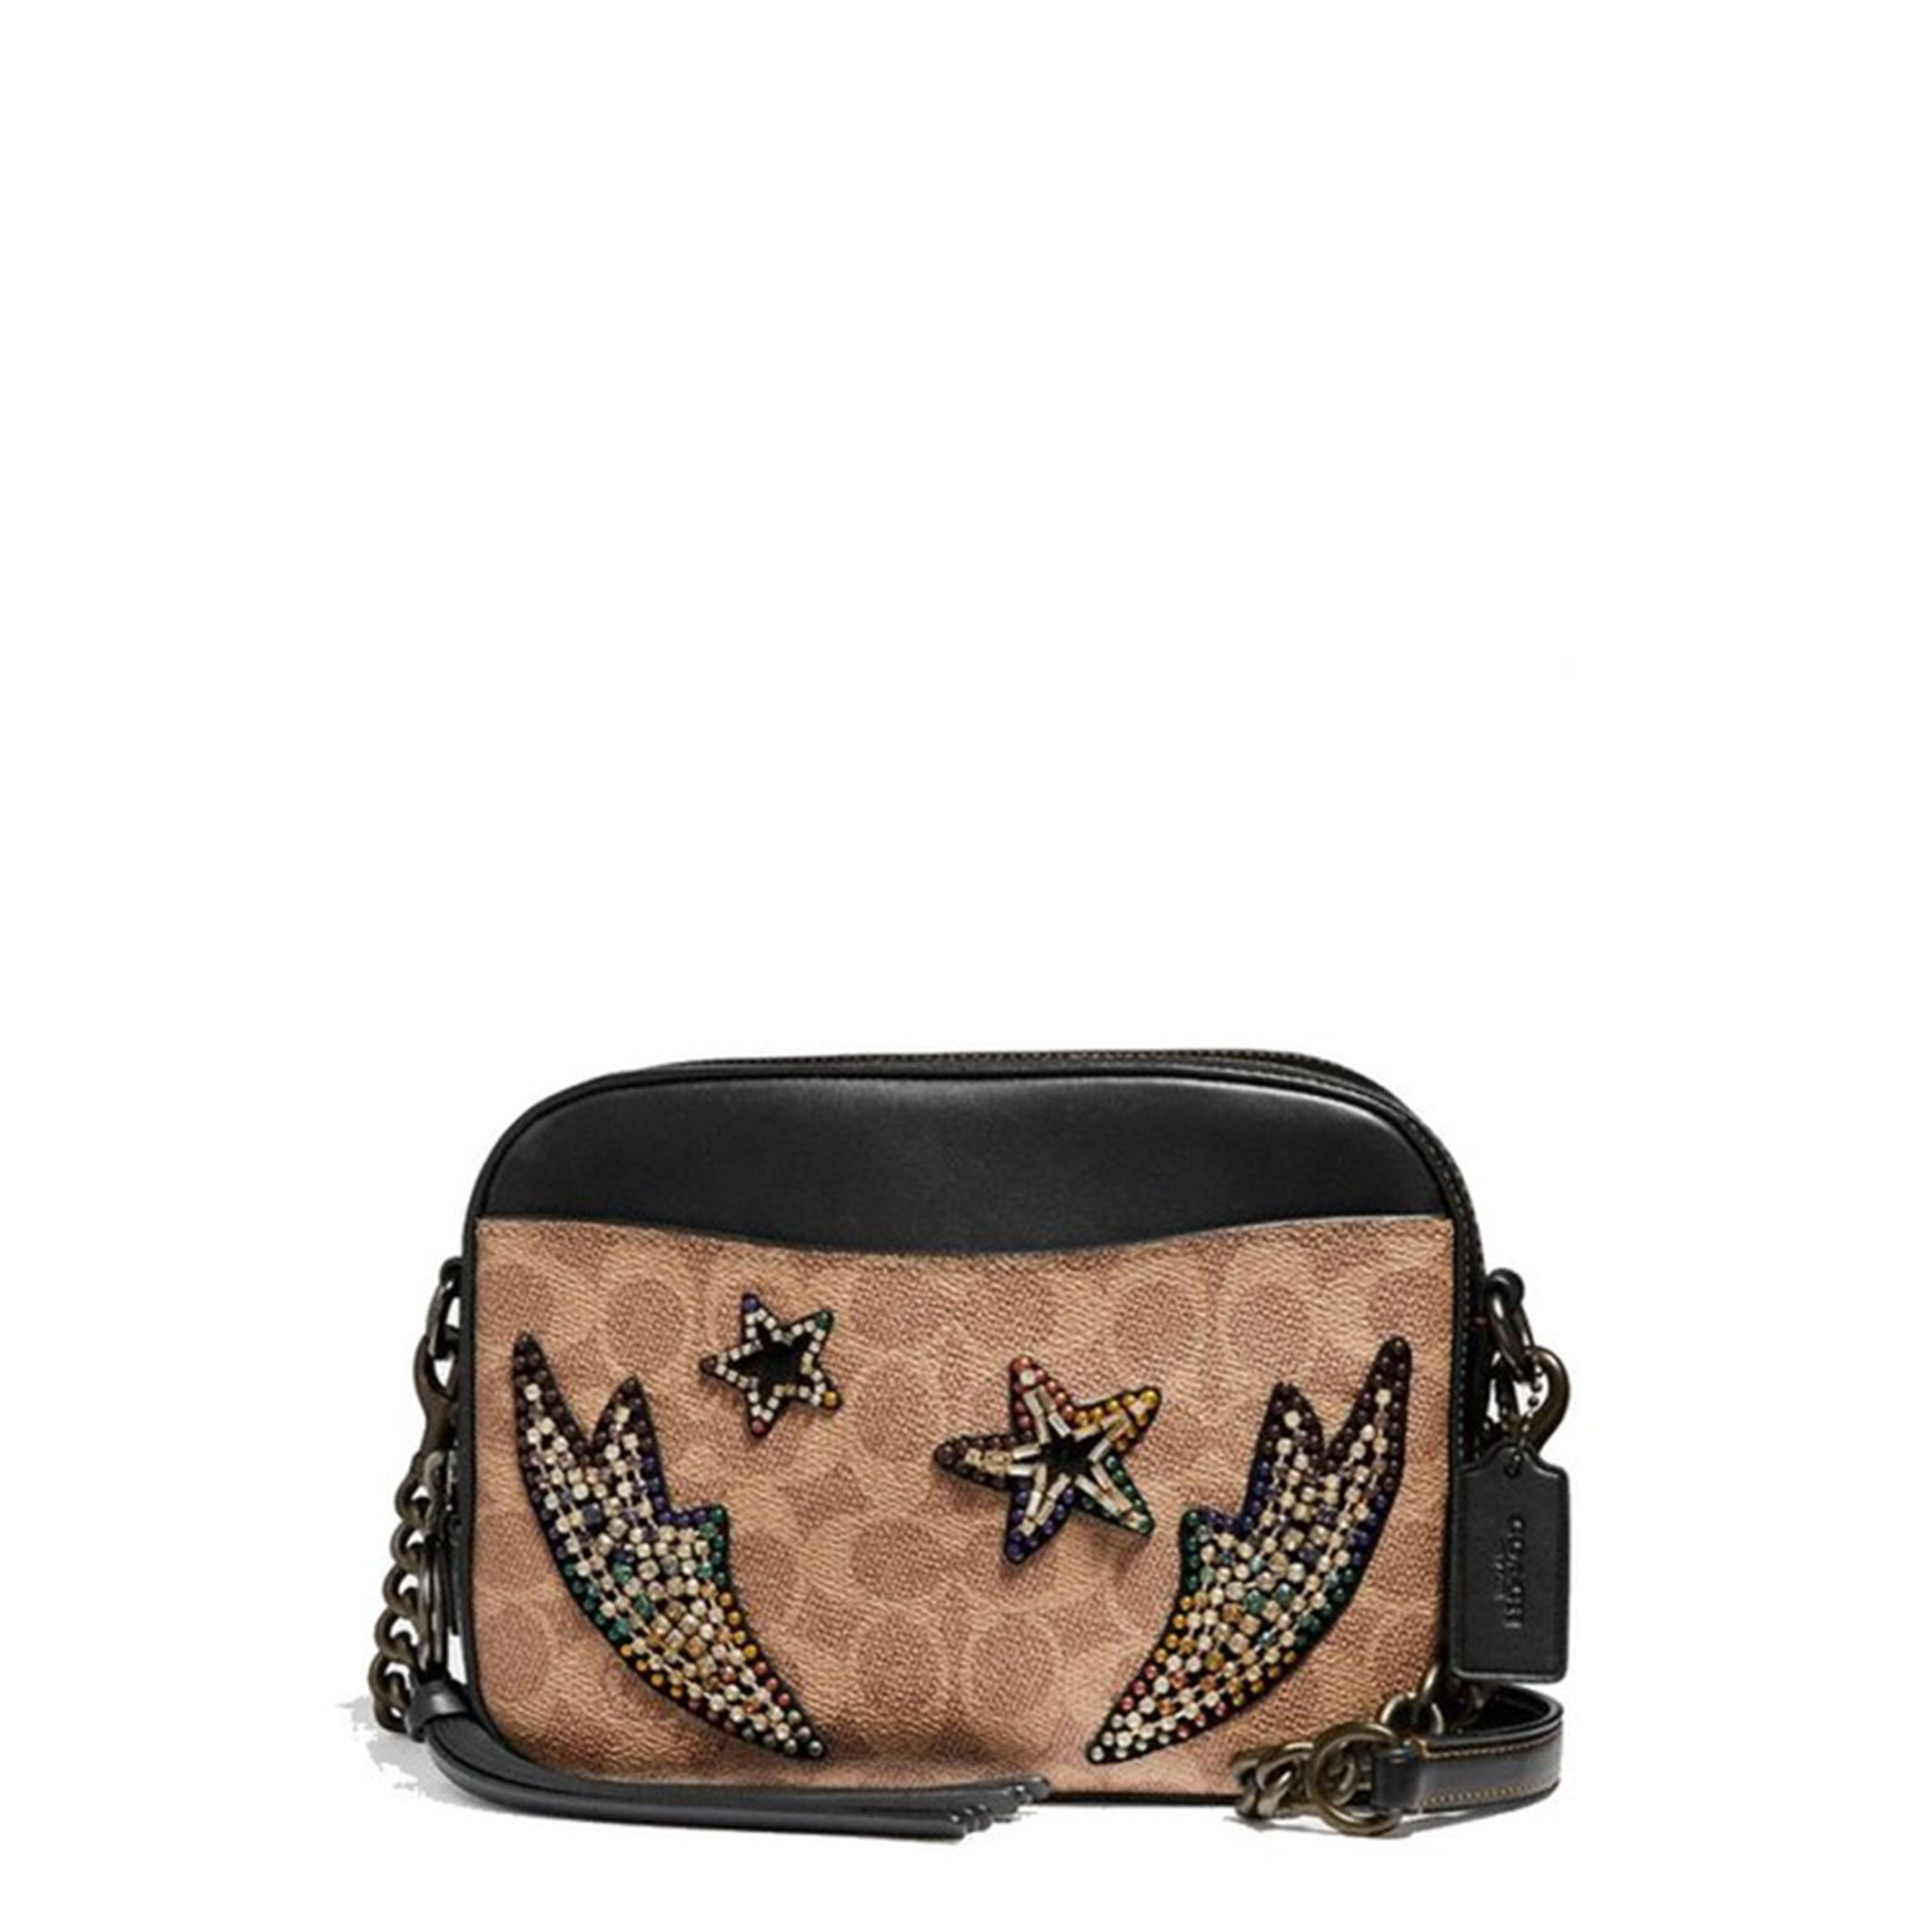 Coach Womens Crossbody Bags